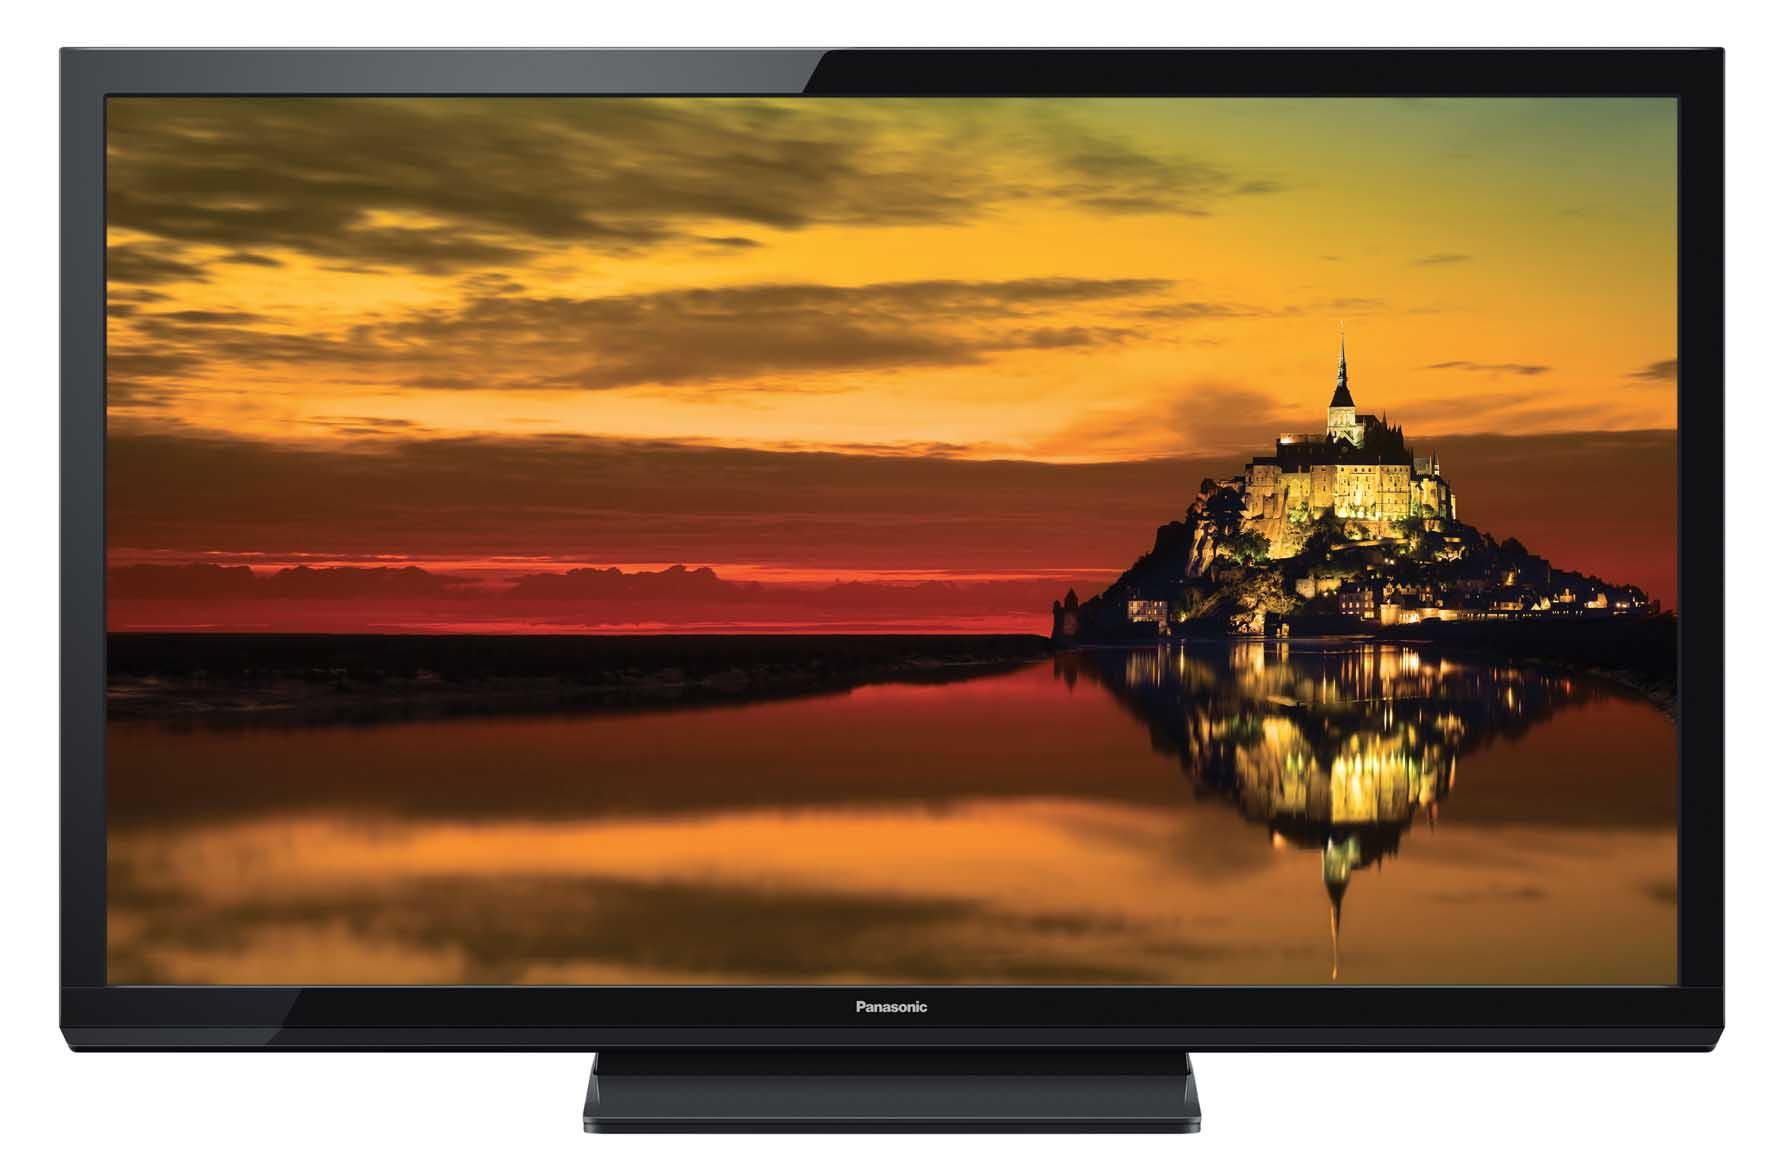 Panasonic tv plasma TX-P50X60 schermo colorato 1